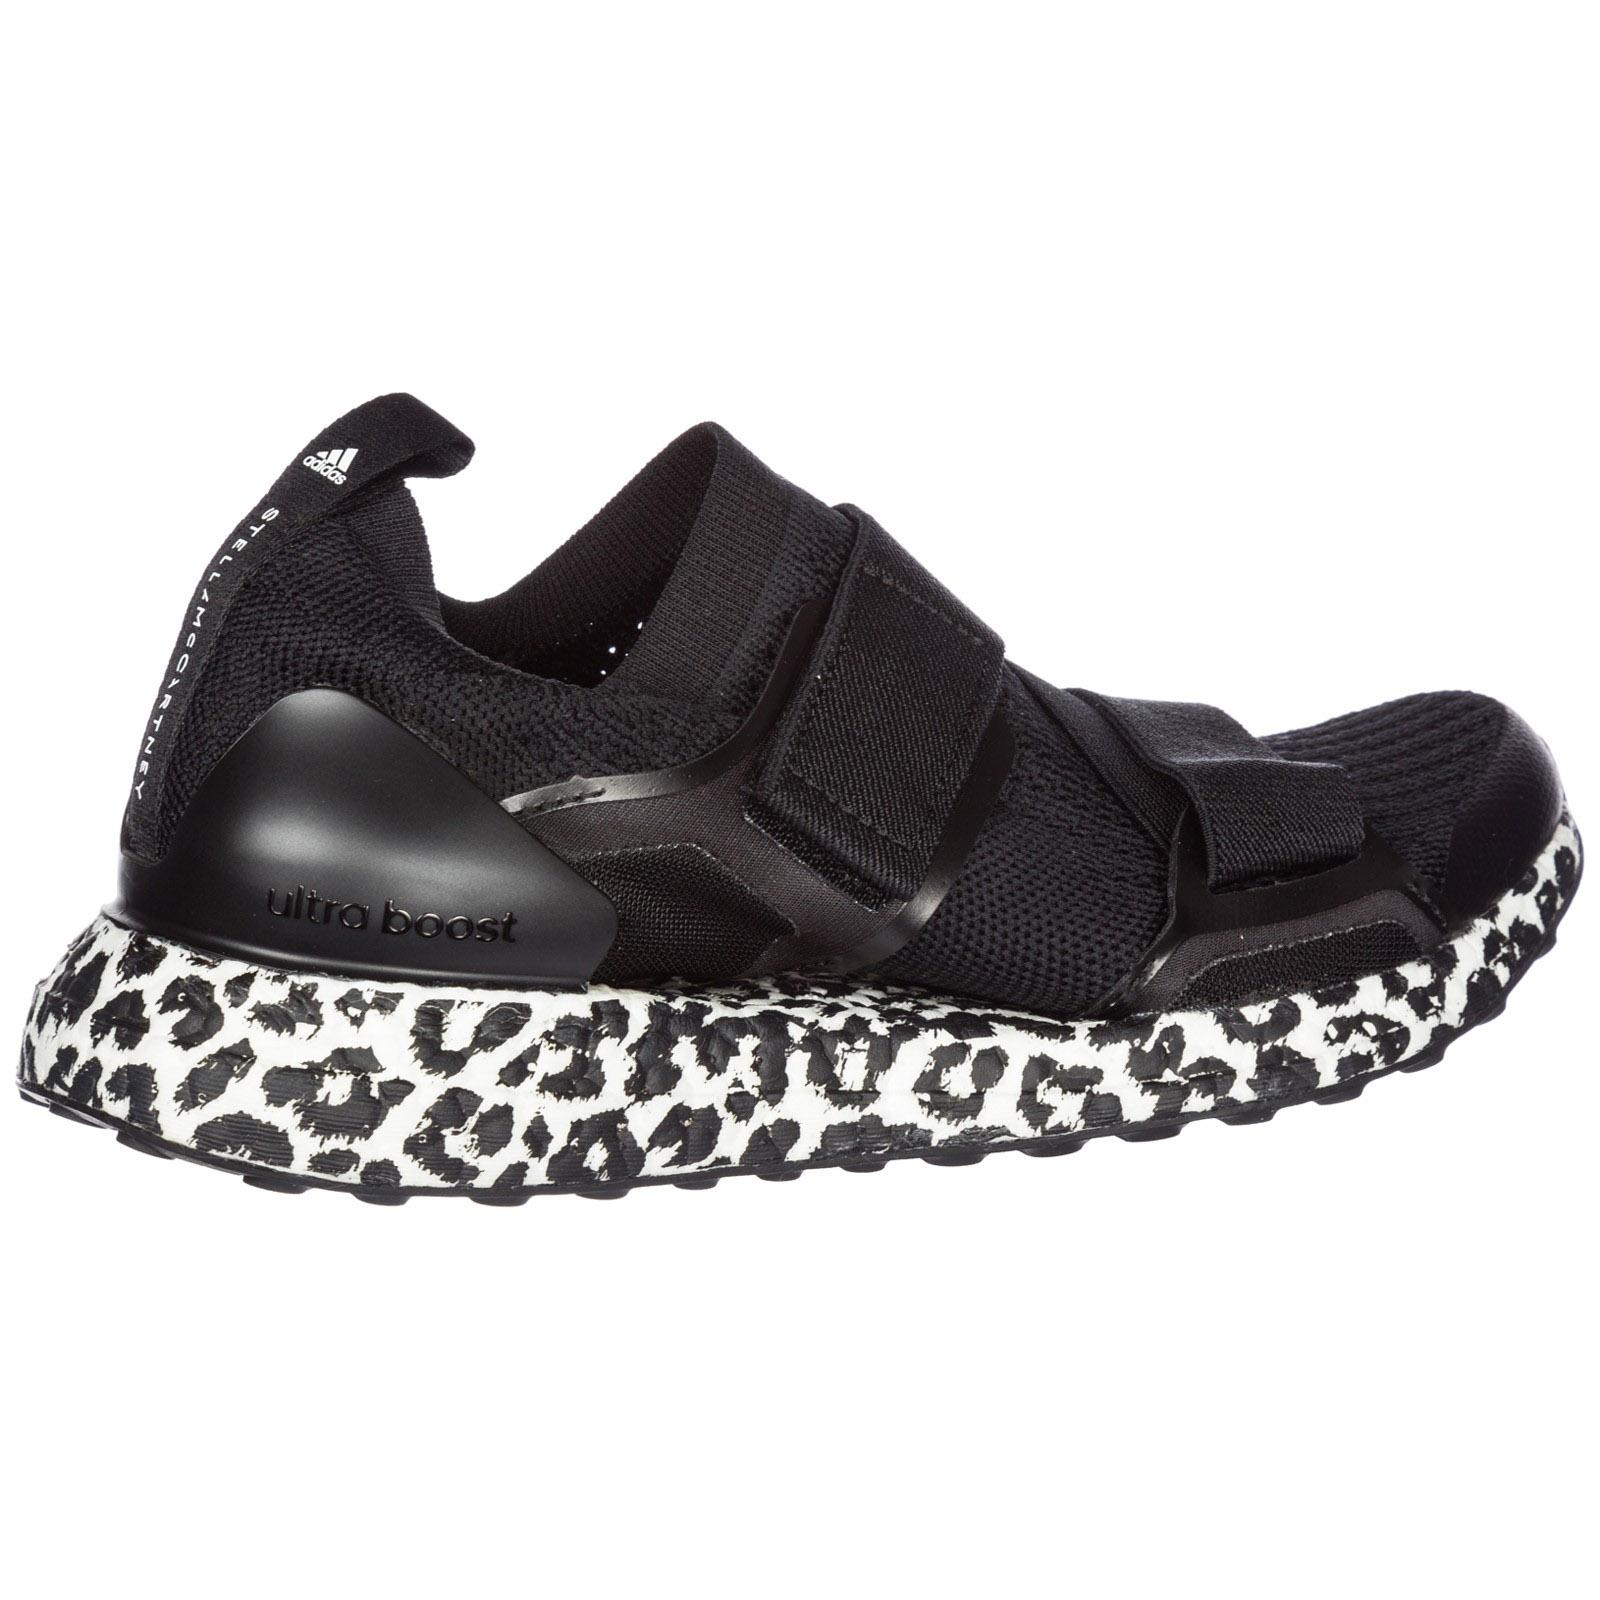 Sneakers Adidas by Stella McCartney Ultraboost X B75904 core black ... f145779e7